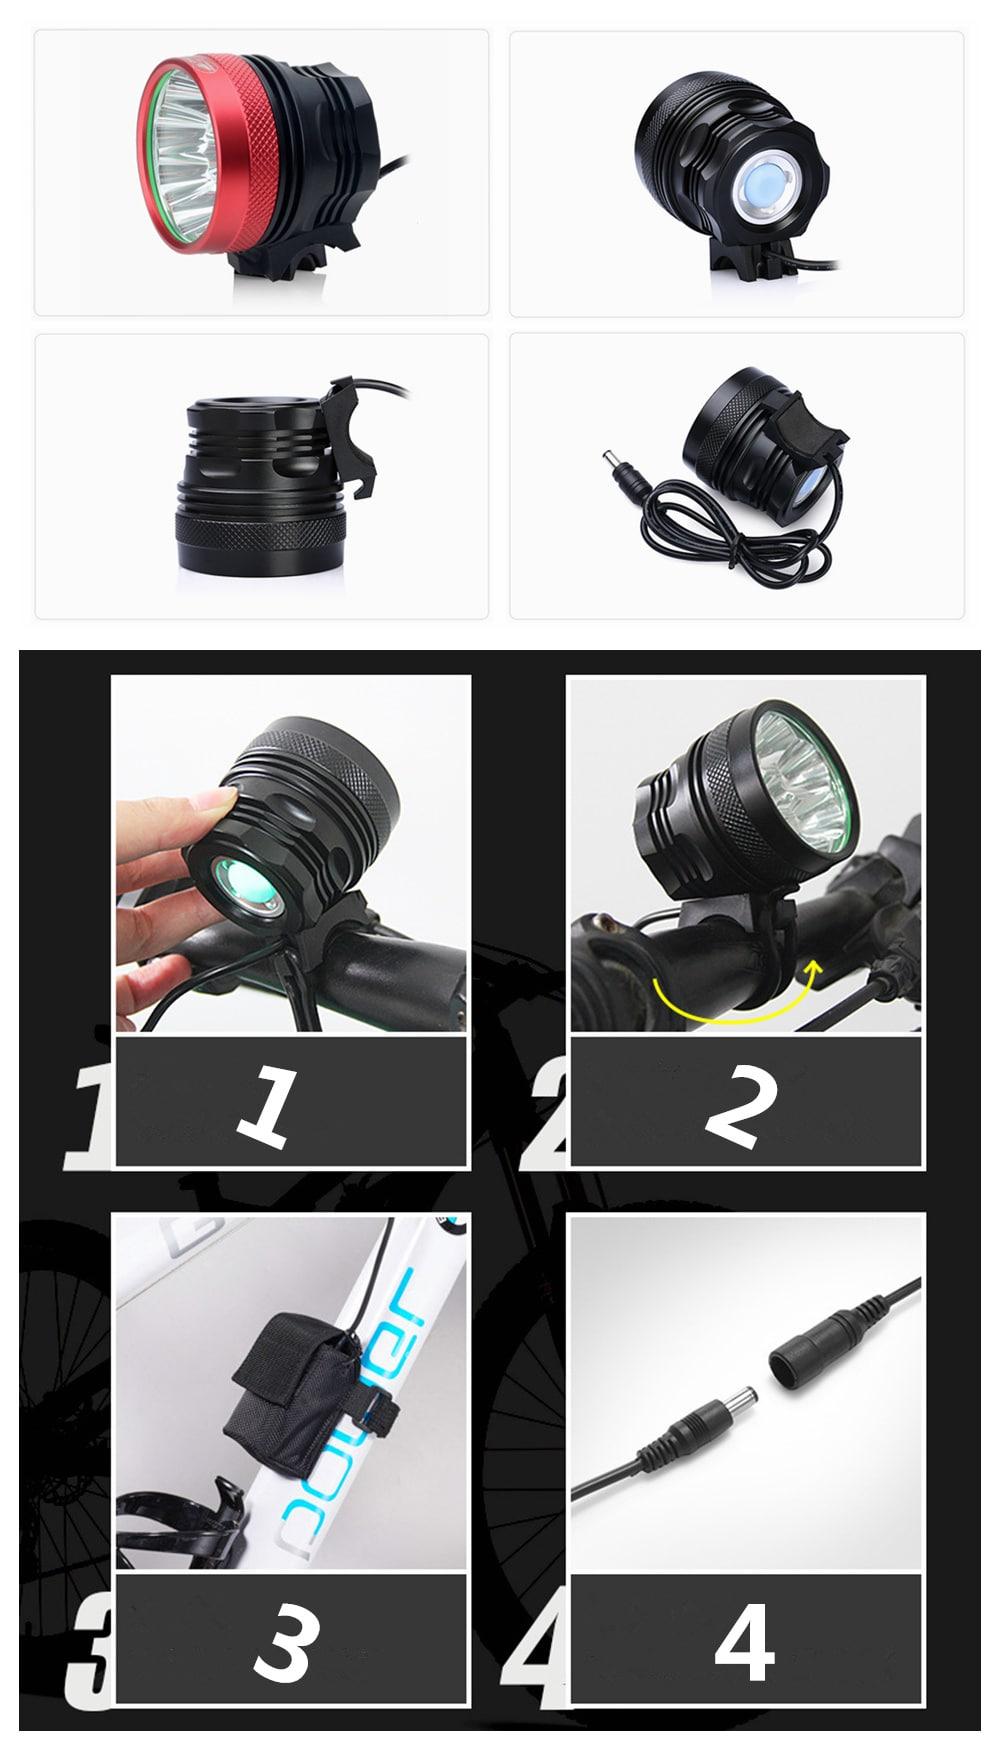 Zhishunjia B13 13-LED 3-Mode Cold White Bike Light / Headlamp-10x18650 Batteries- Red